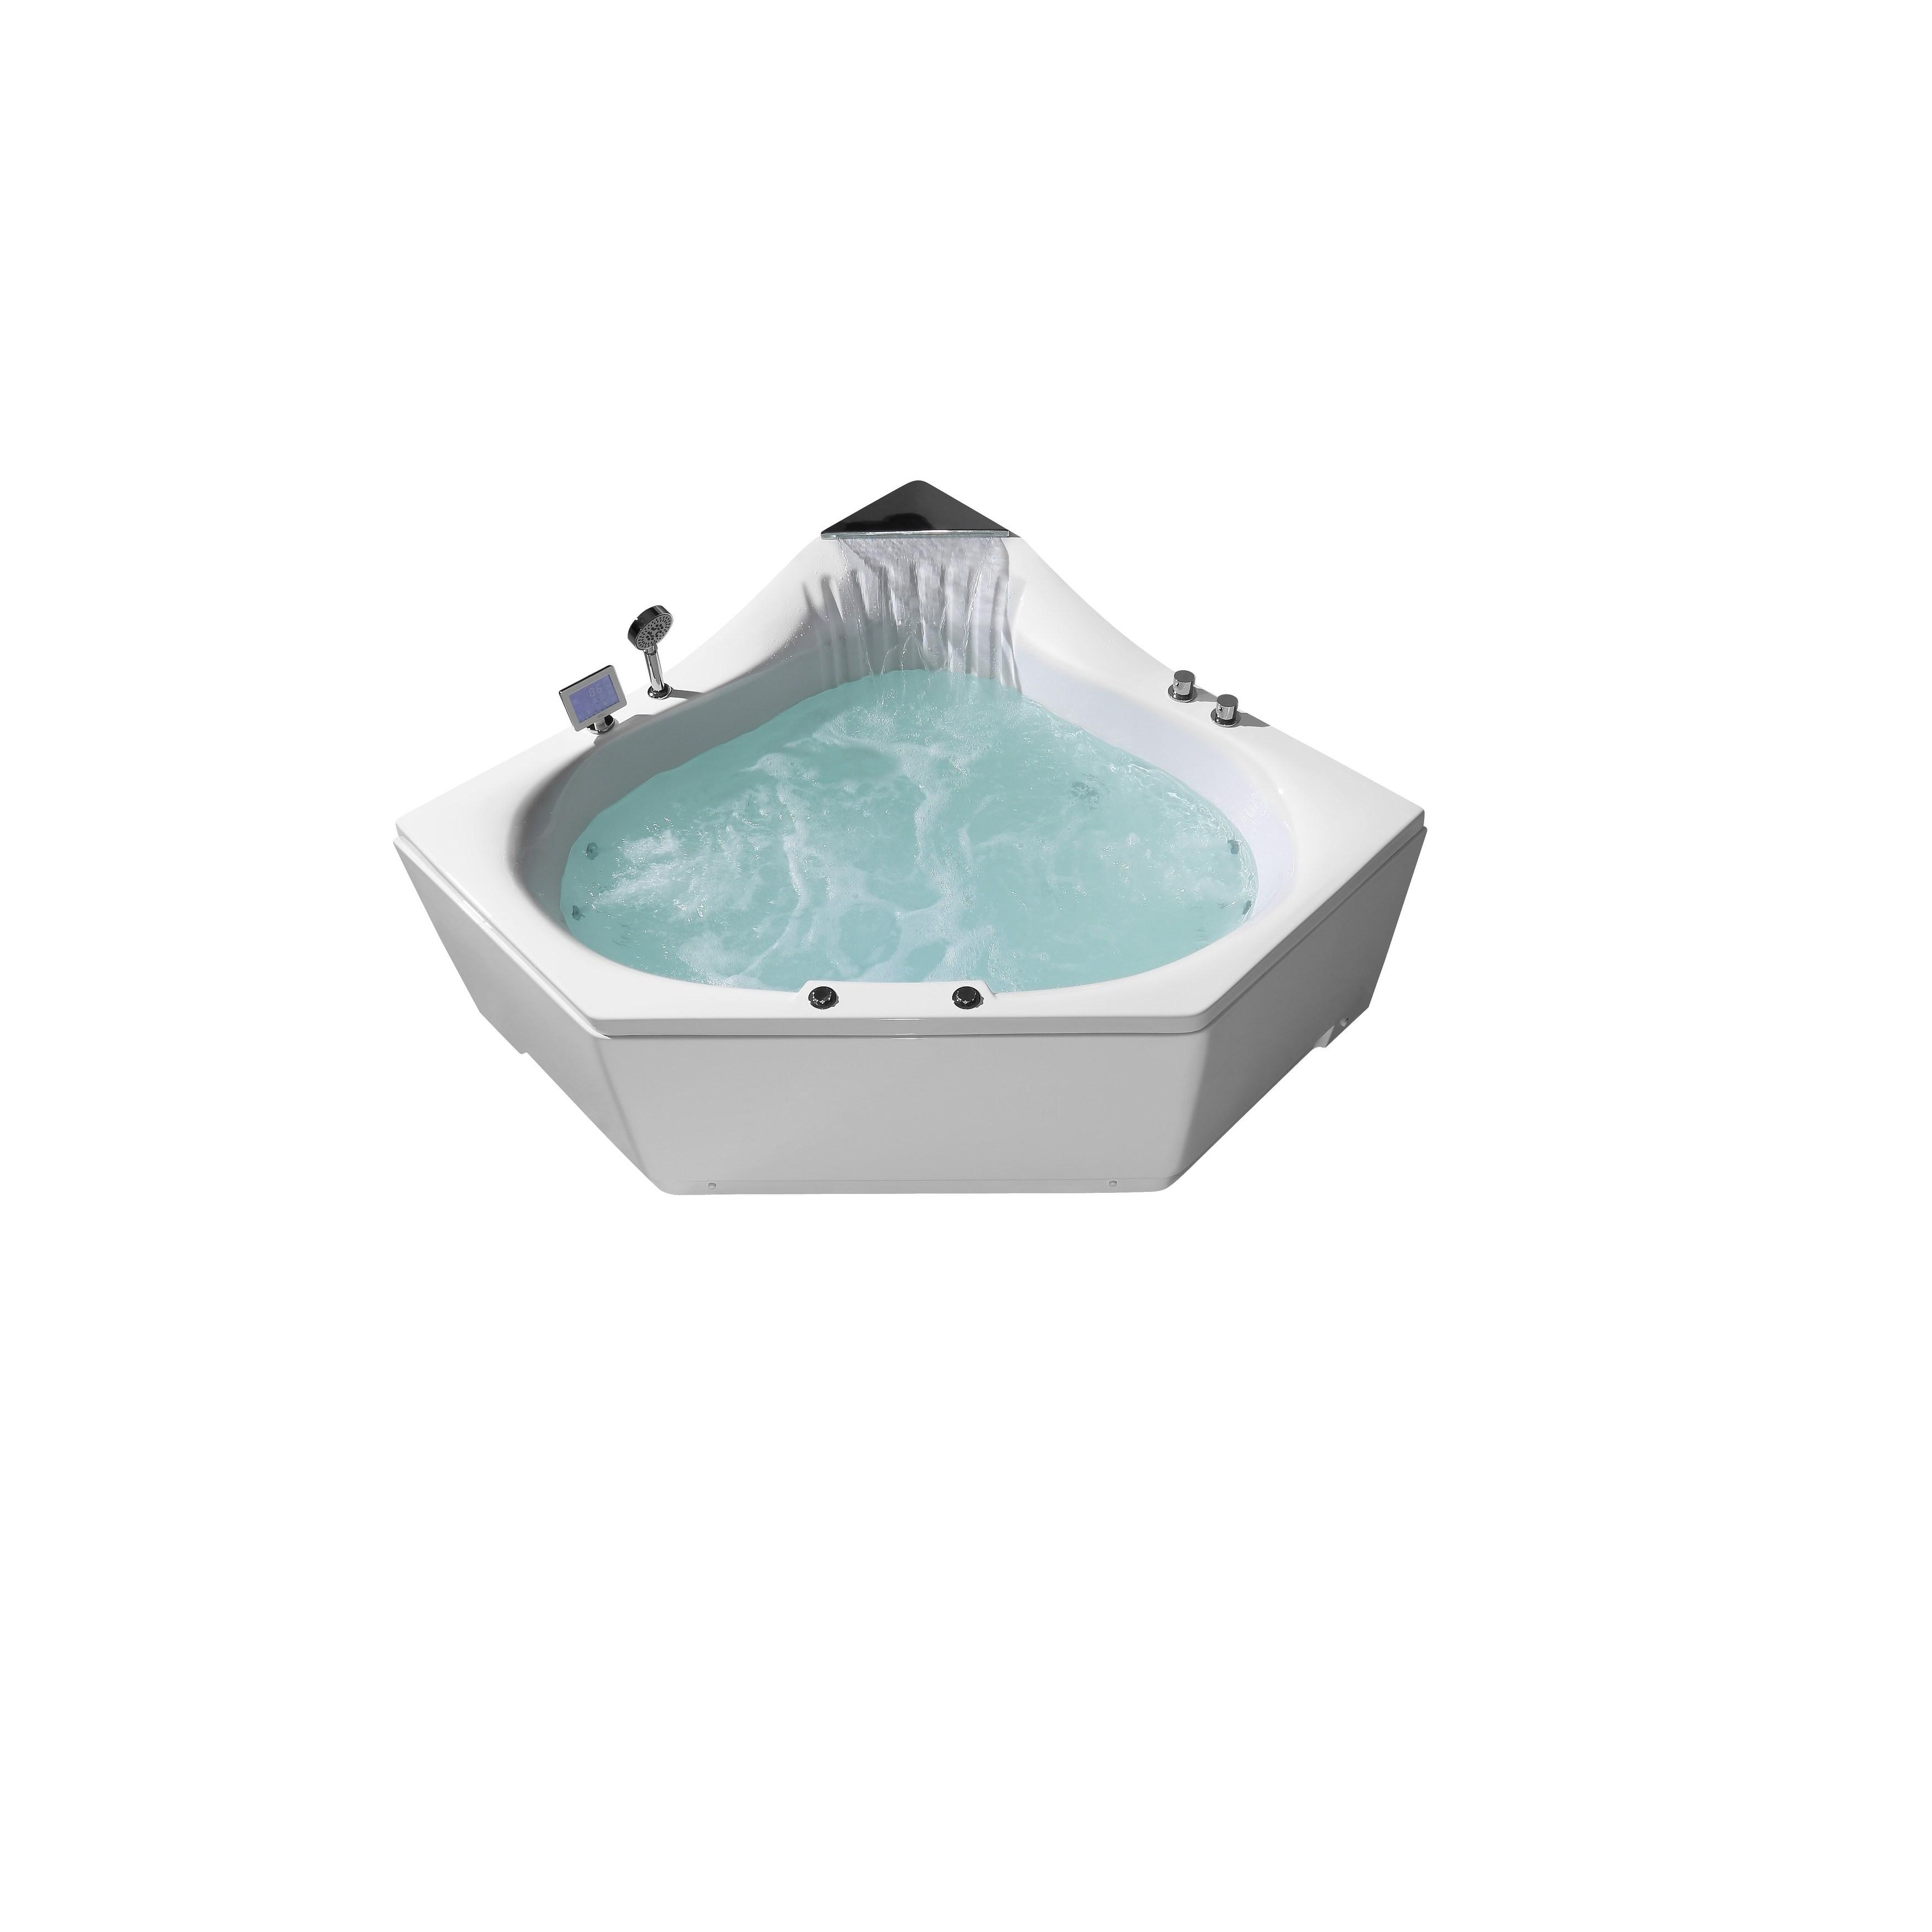 ARIEL 59″ Acrylic Center Drain Corner Alcove Whirlpool Bathtub